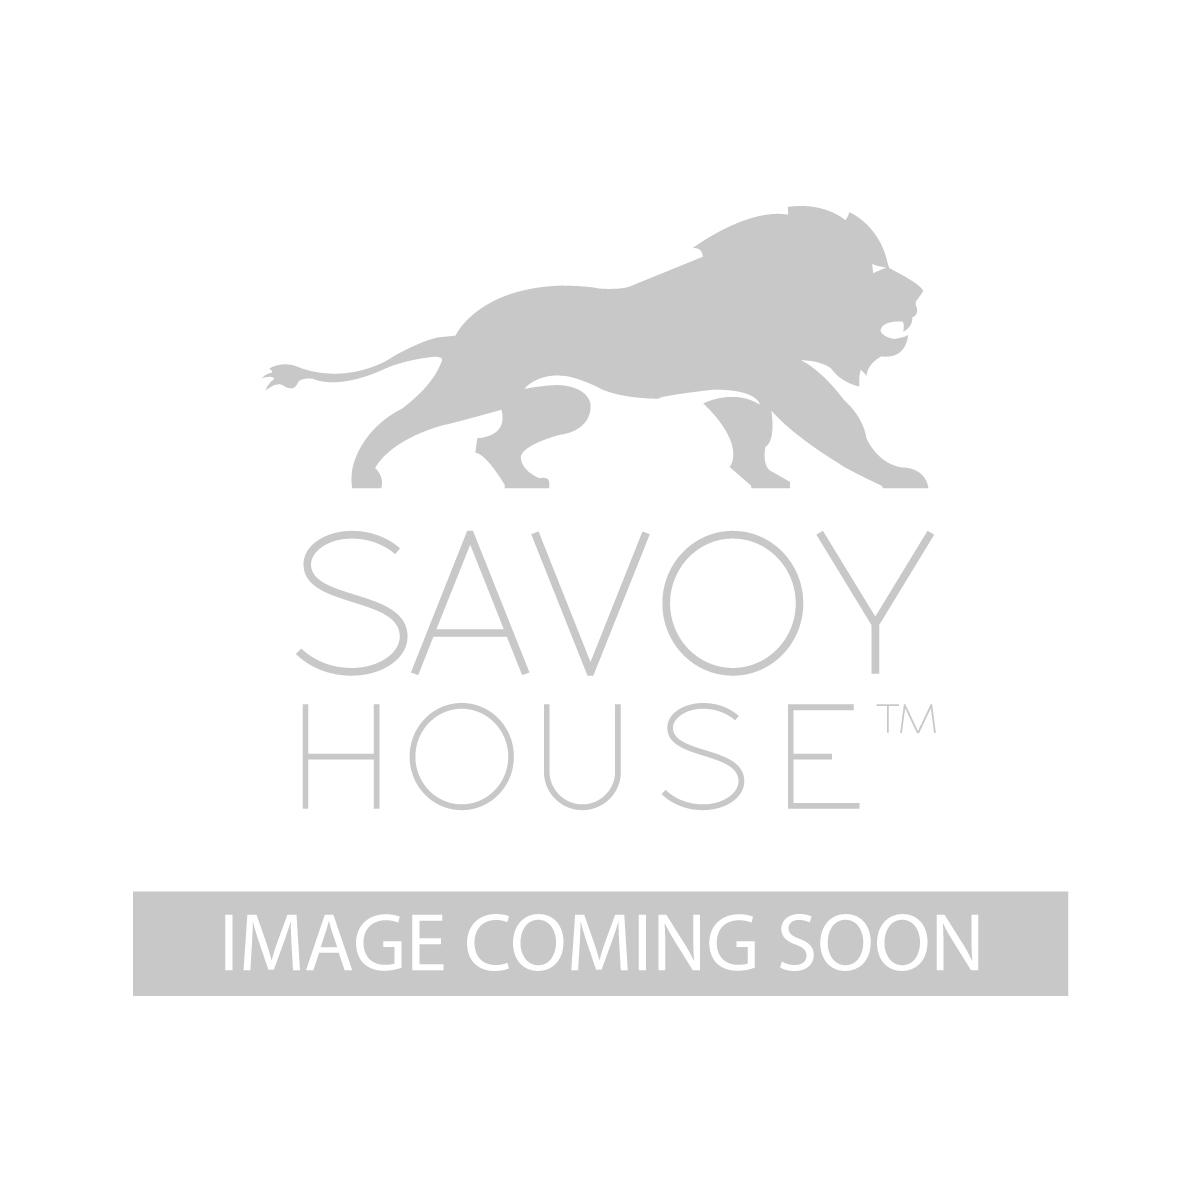 52-CDC-5RV-SN Sierra Madres Ceiling Fan by Savoy House